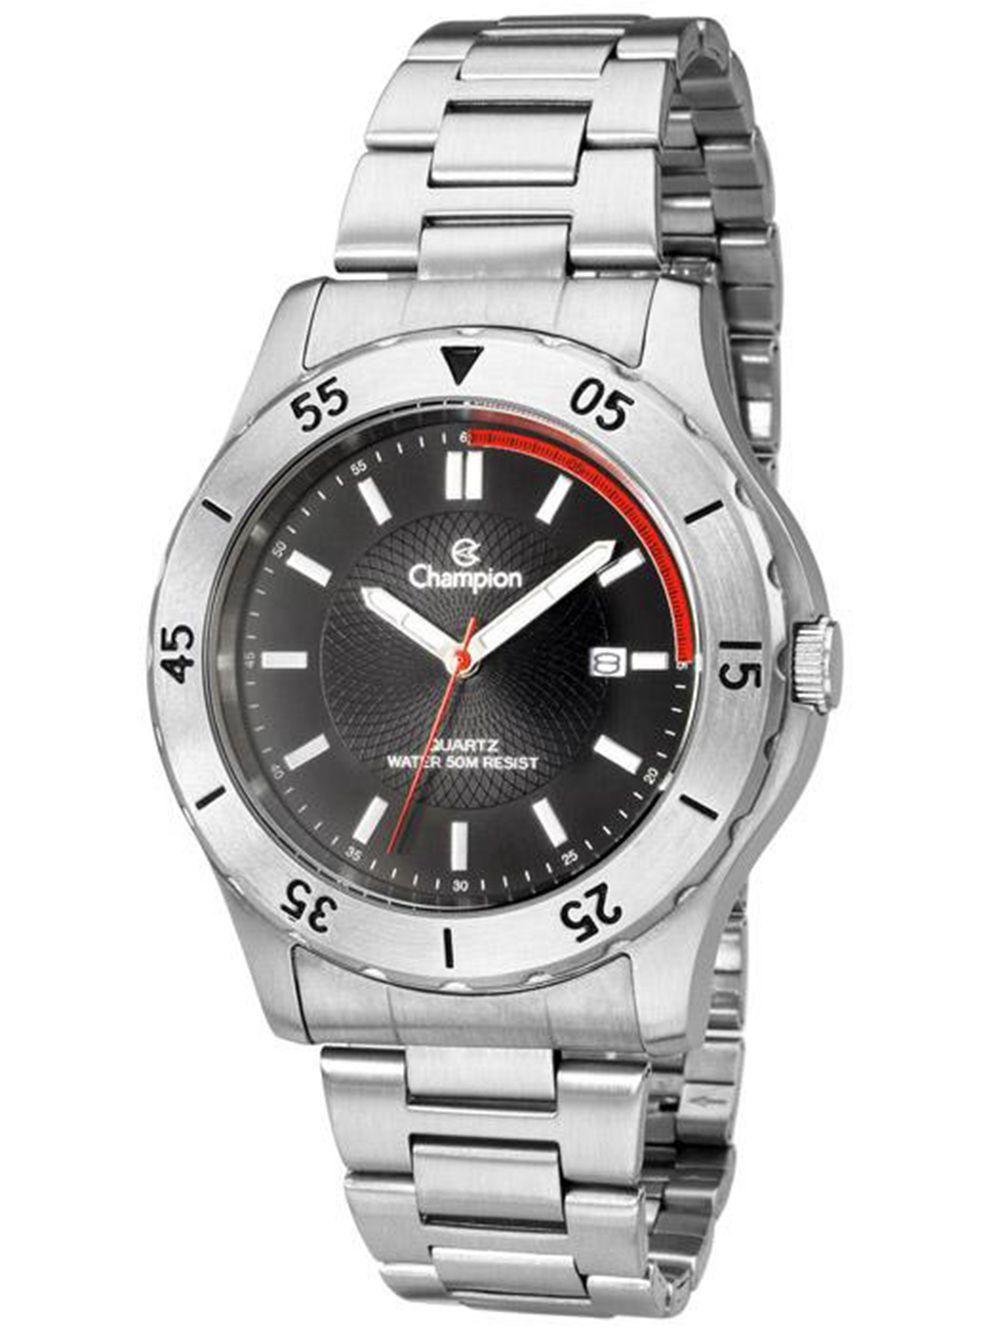 119eae9e854 Relógio Champion Prateado Masculino Analógico CA30169T - Miranda Shopping  ...